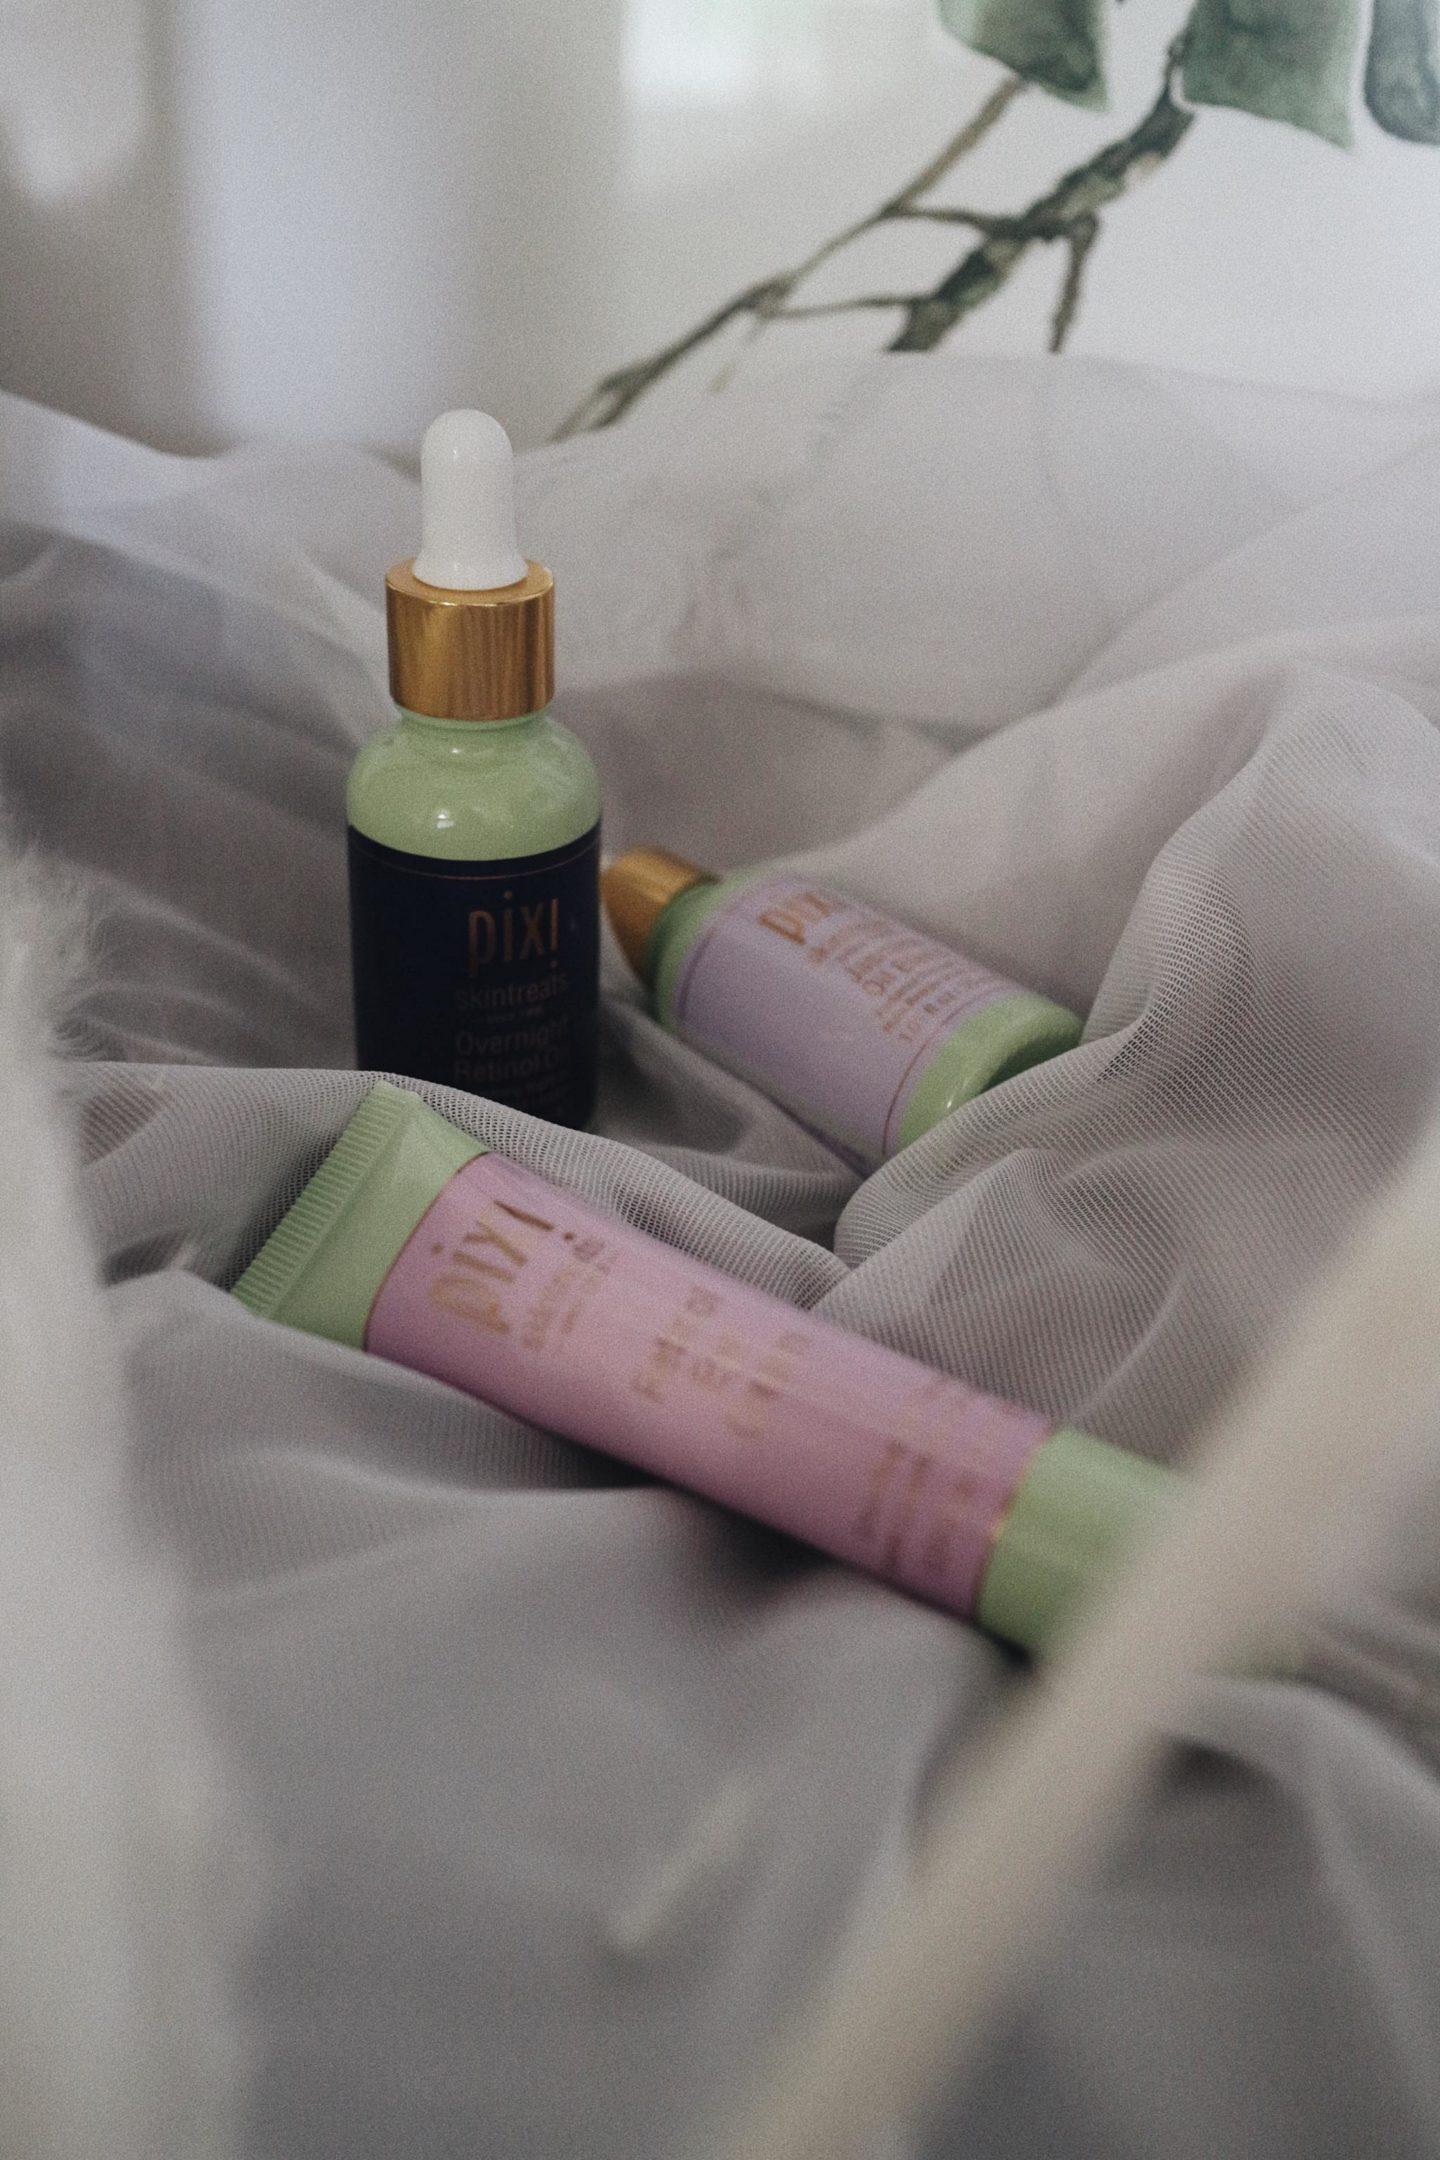 Pixi Beauty retinol and jasmine collection